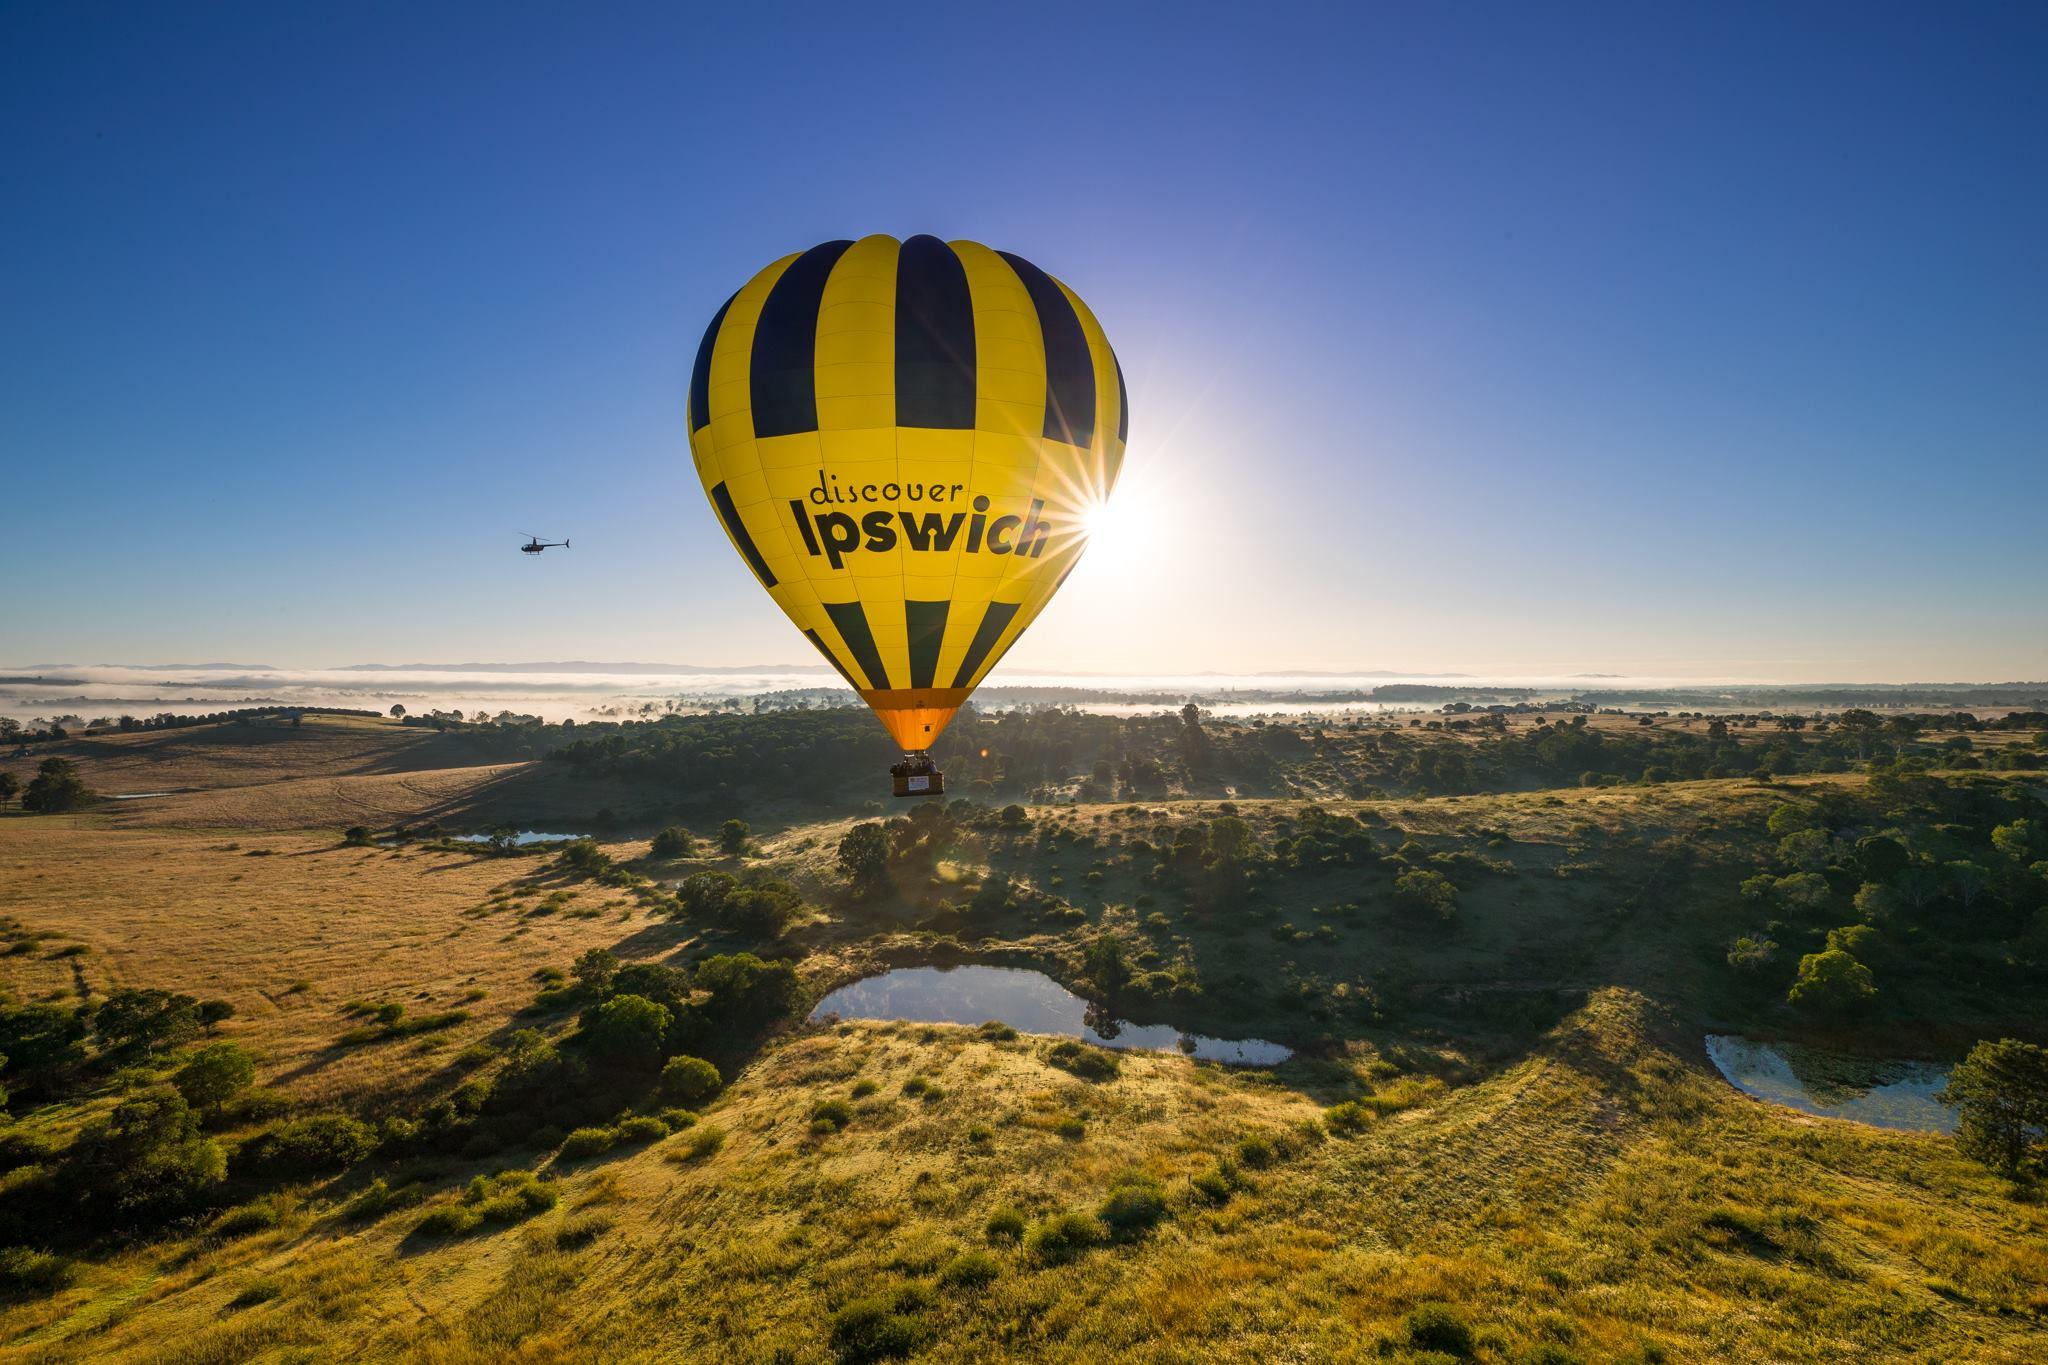 1C. 大布里斯班观景热气球飞行套餐 -1小时飞行、早餐及自驾 [Greater Brisbane Scenic Hot Air Balloon Flight Package - 1 Hour Flight, Breakfast & Self Drive]